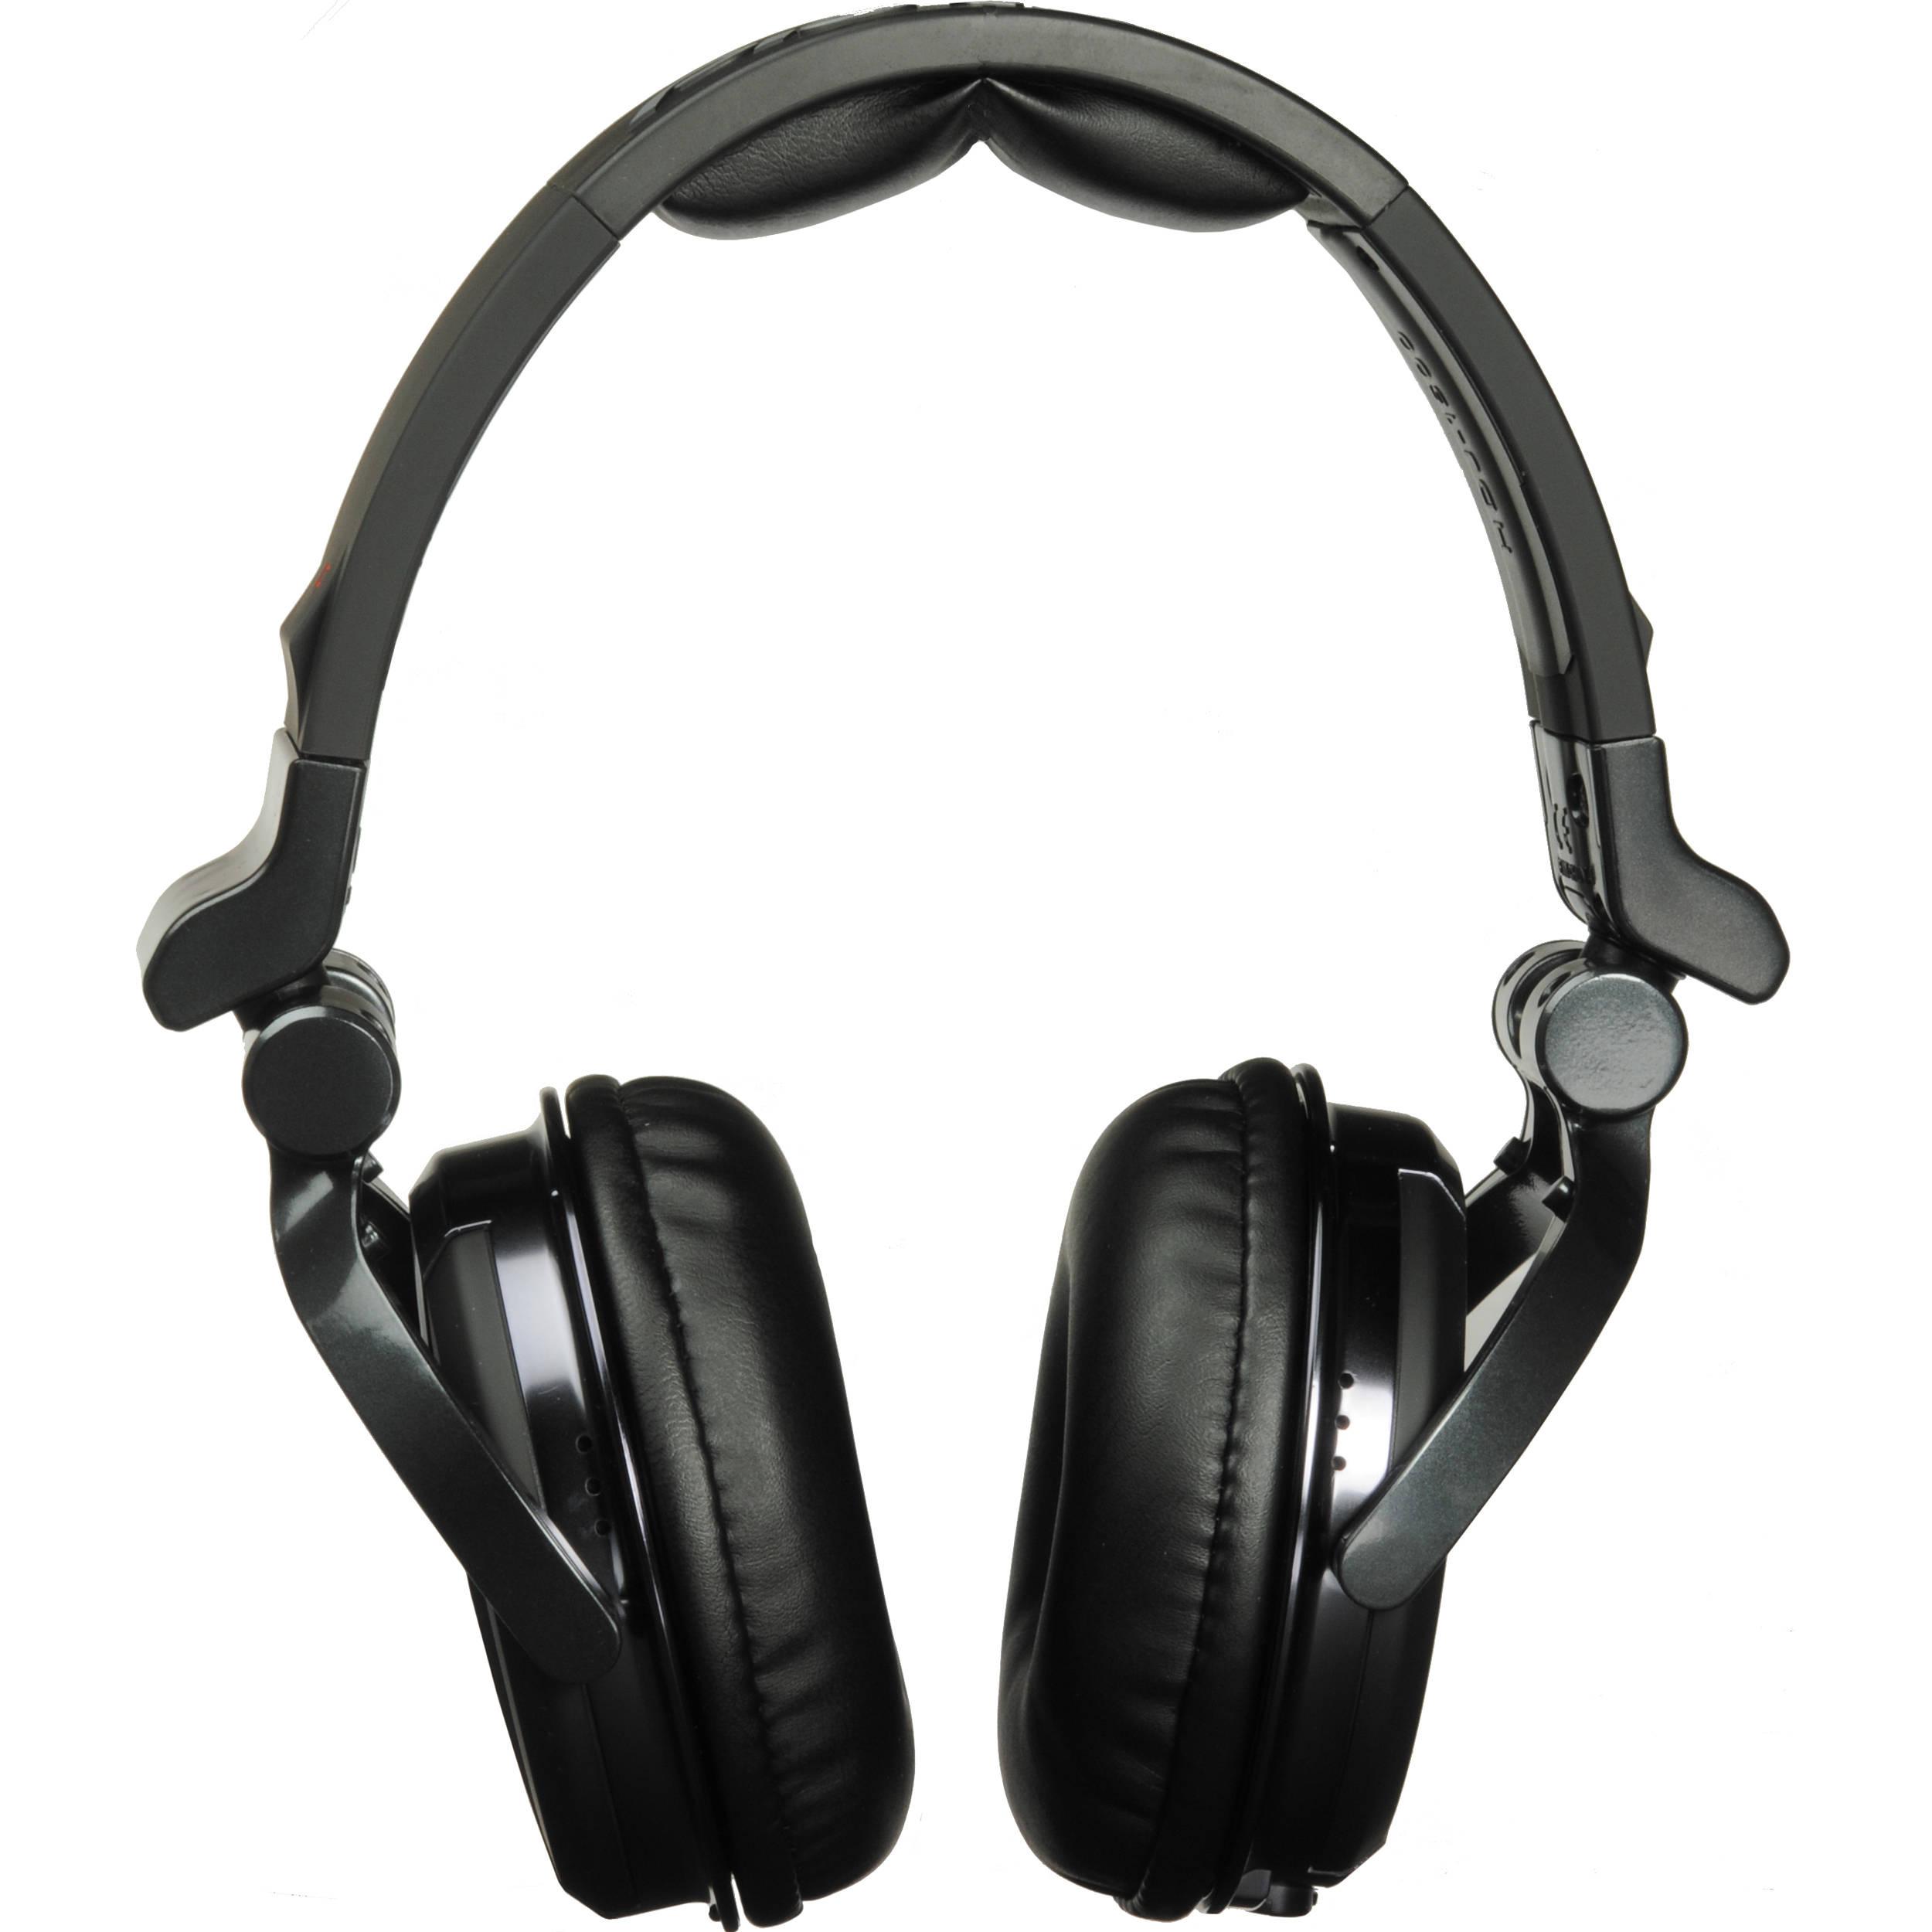 Pioneer HDJ-1500 Professional DJ Headphones (Black)